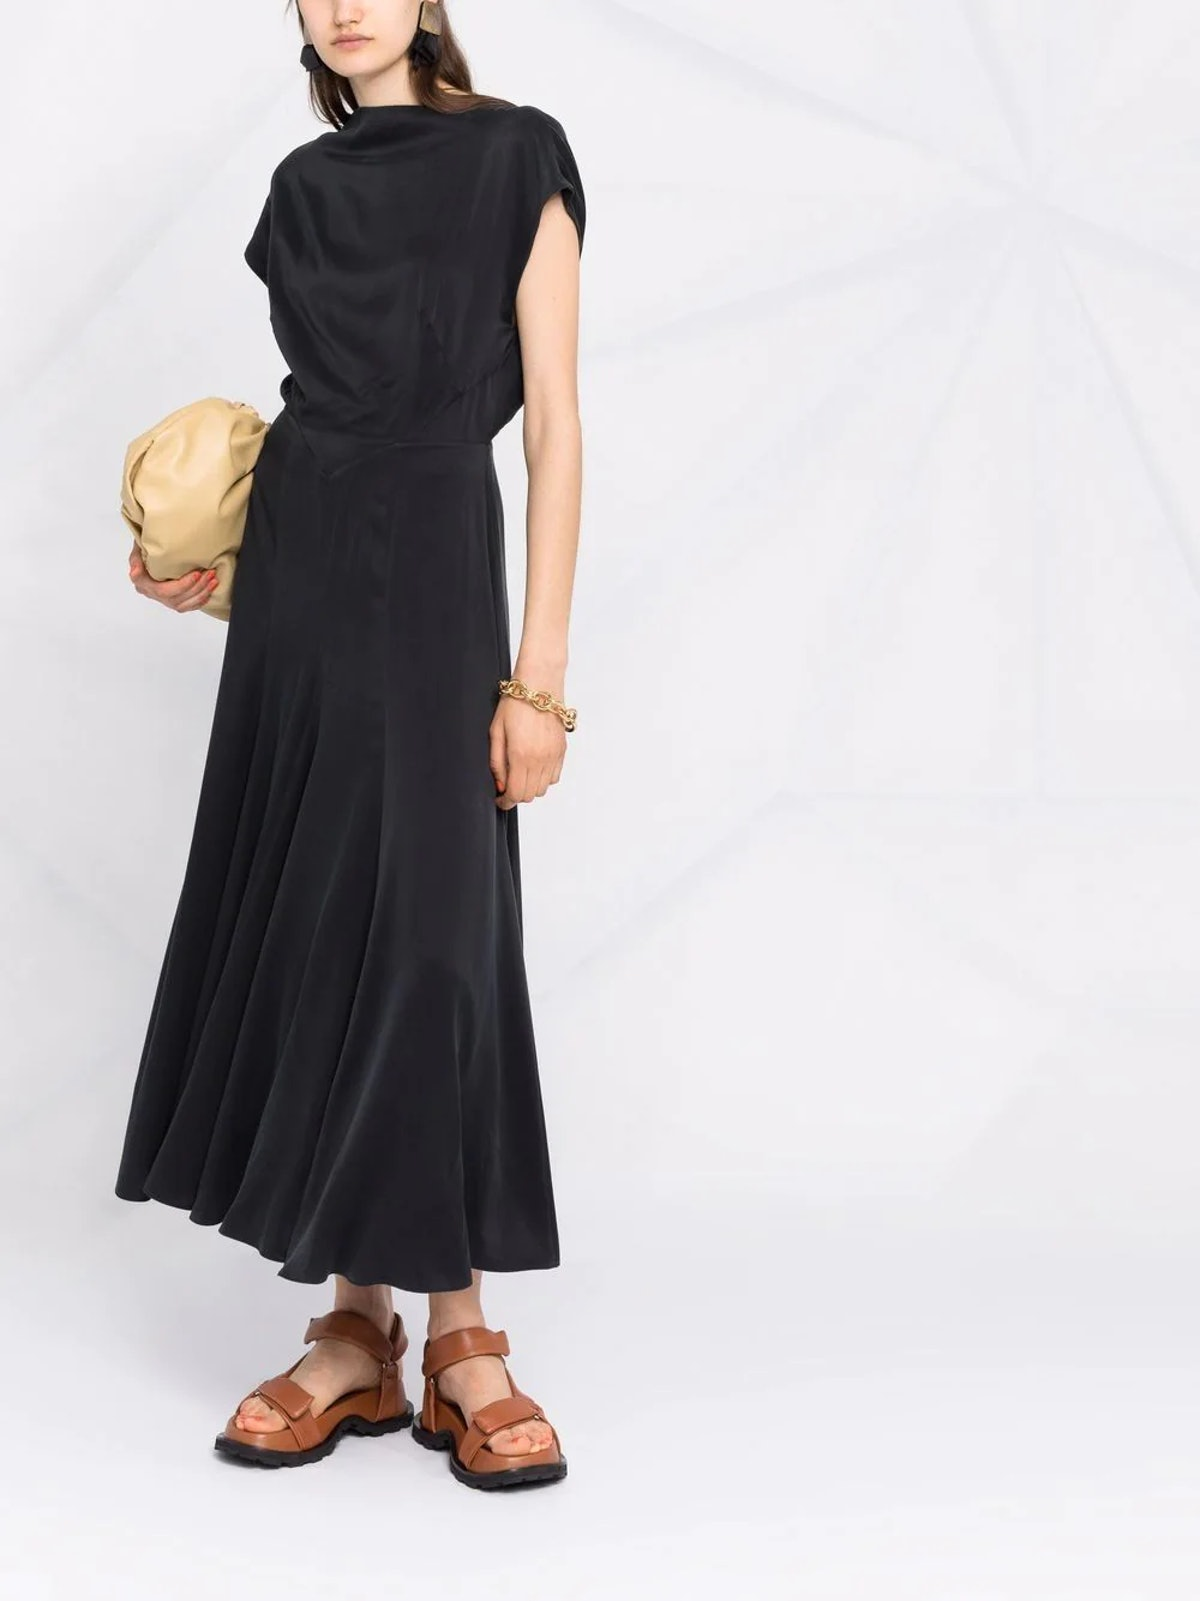 Merloe Sand-Washed Silk Dress